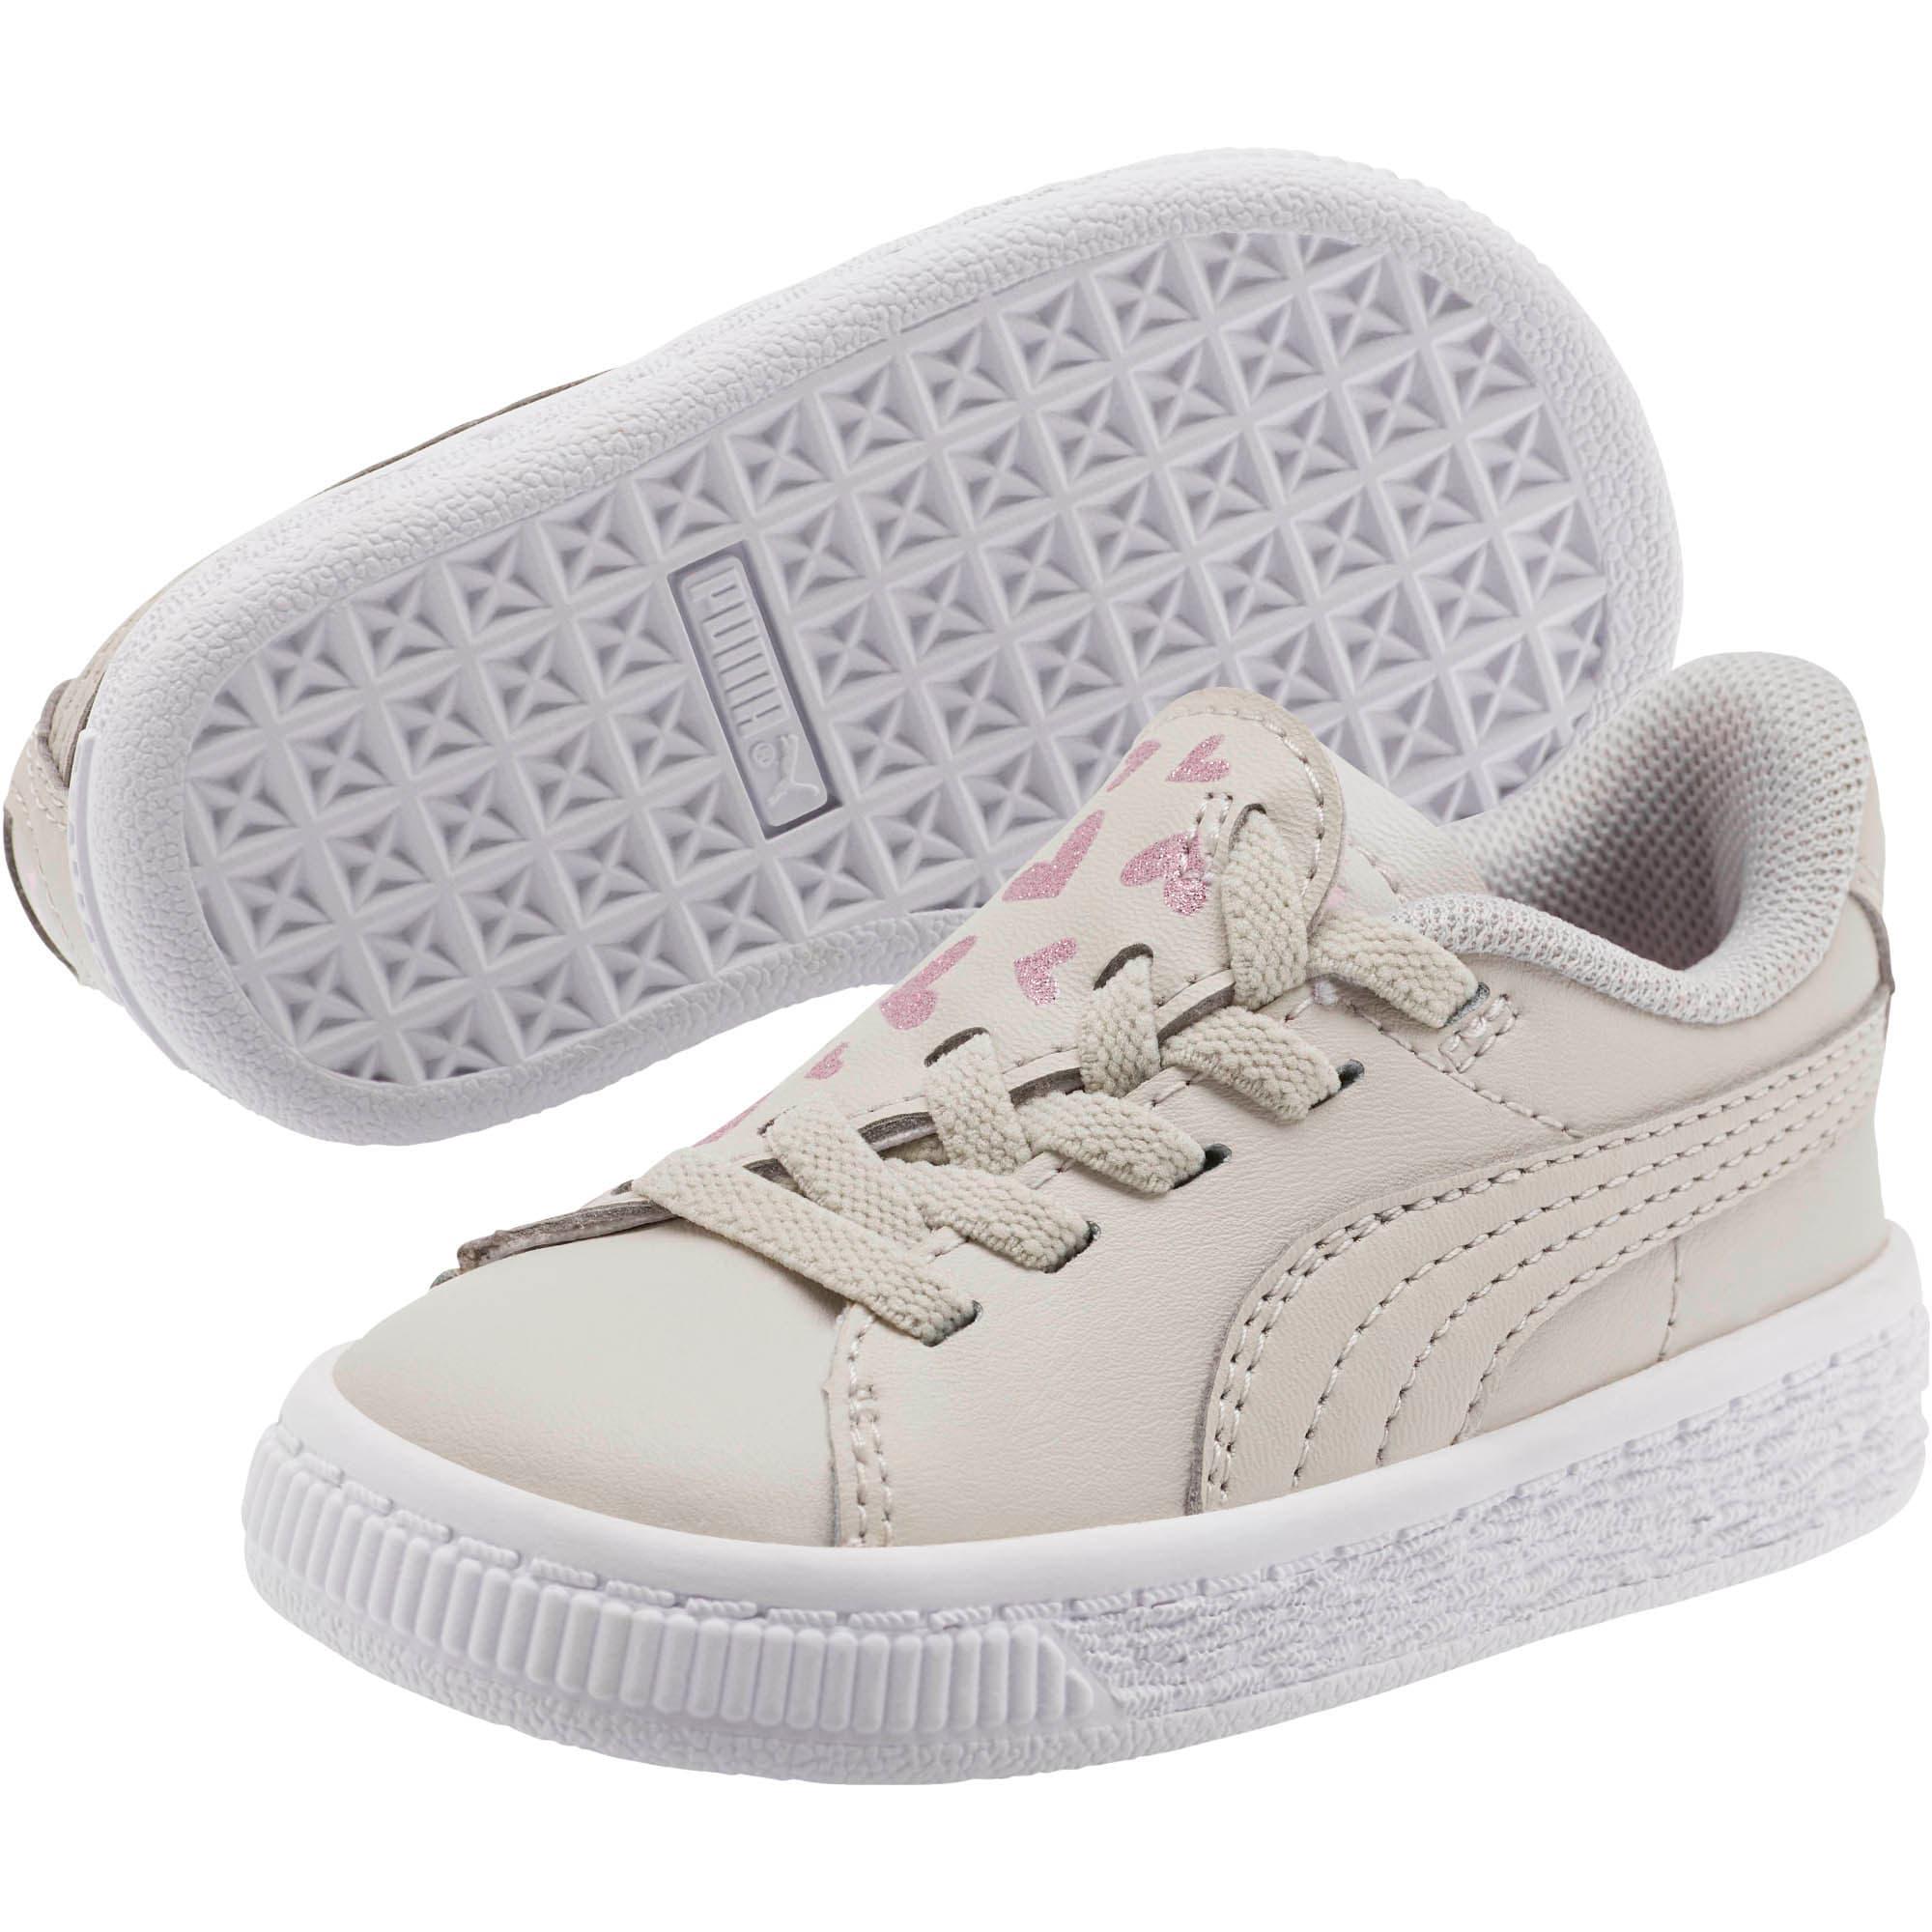 Thumbnail 2 of Basket Crush Glitter Hearts AC Toddler Shoes, Gray Violet-Puma White, medium